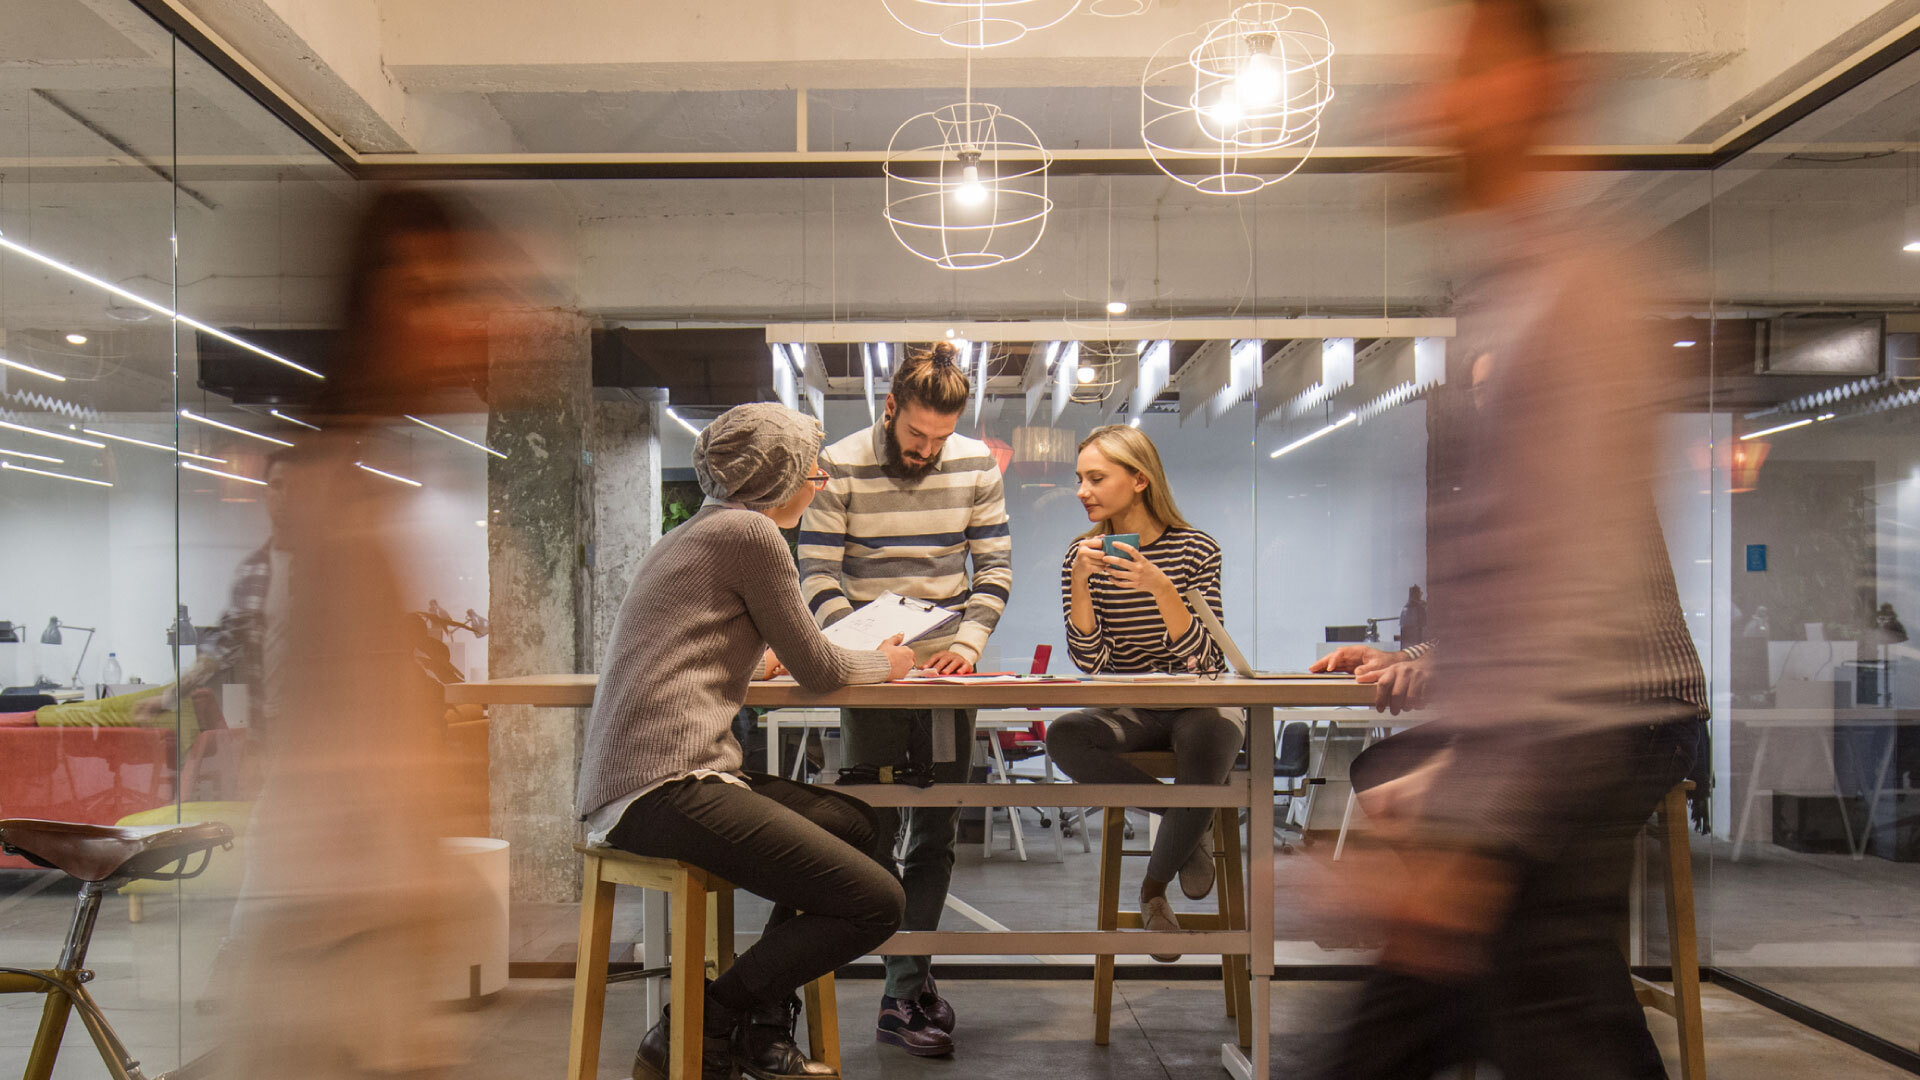 Top 5 Digital Marketing Trends for 2020